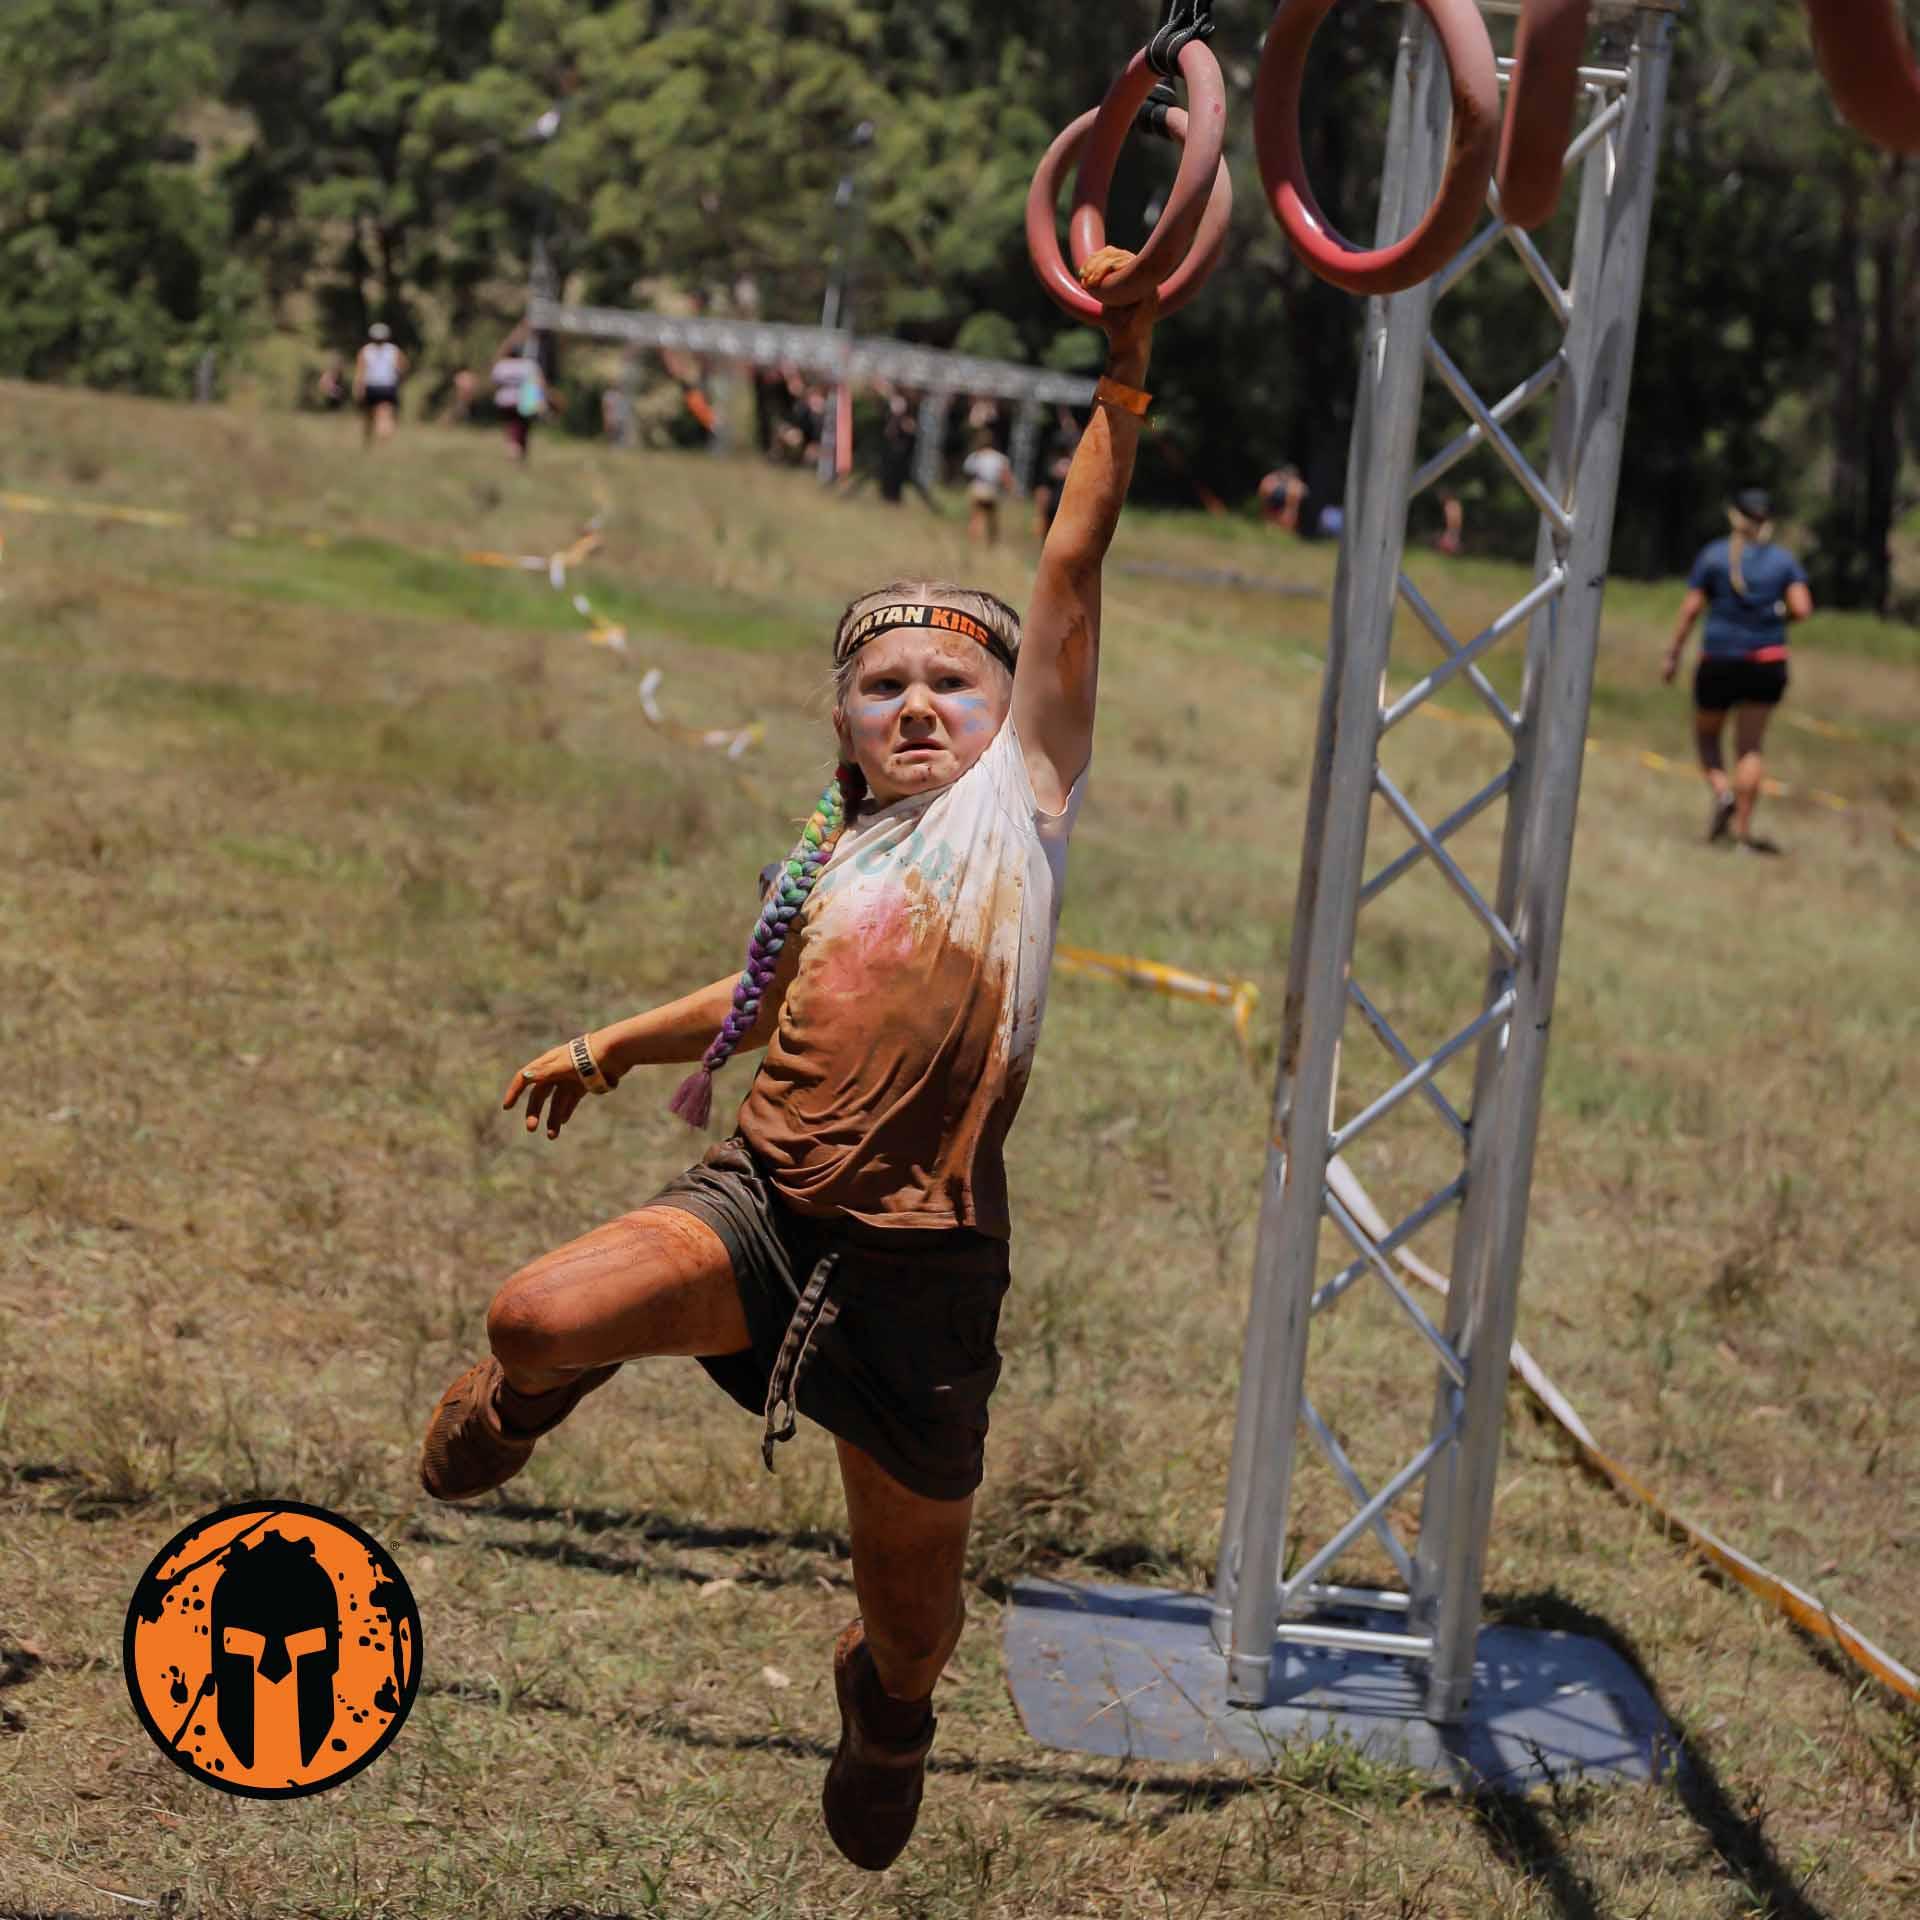 Spartan Auckland Kids Race - Sunday, August 1st 2021